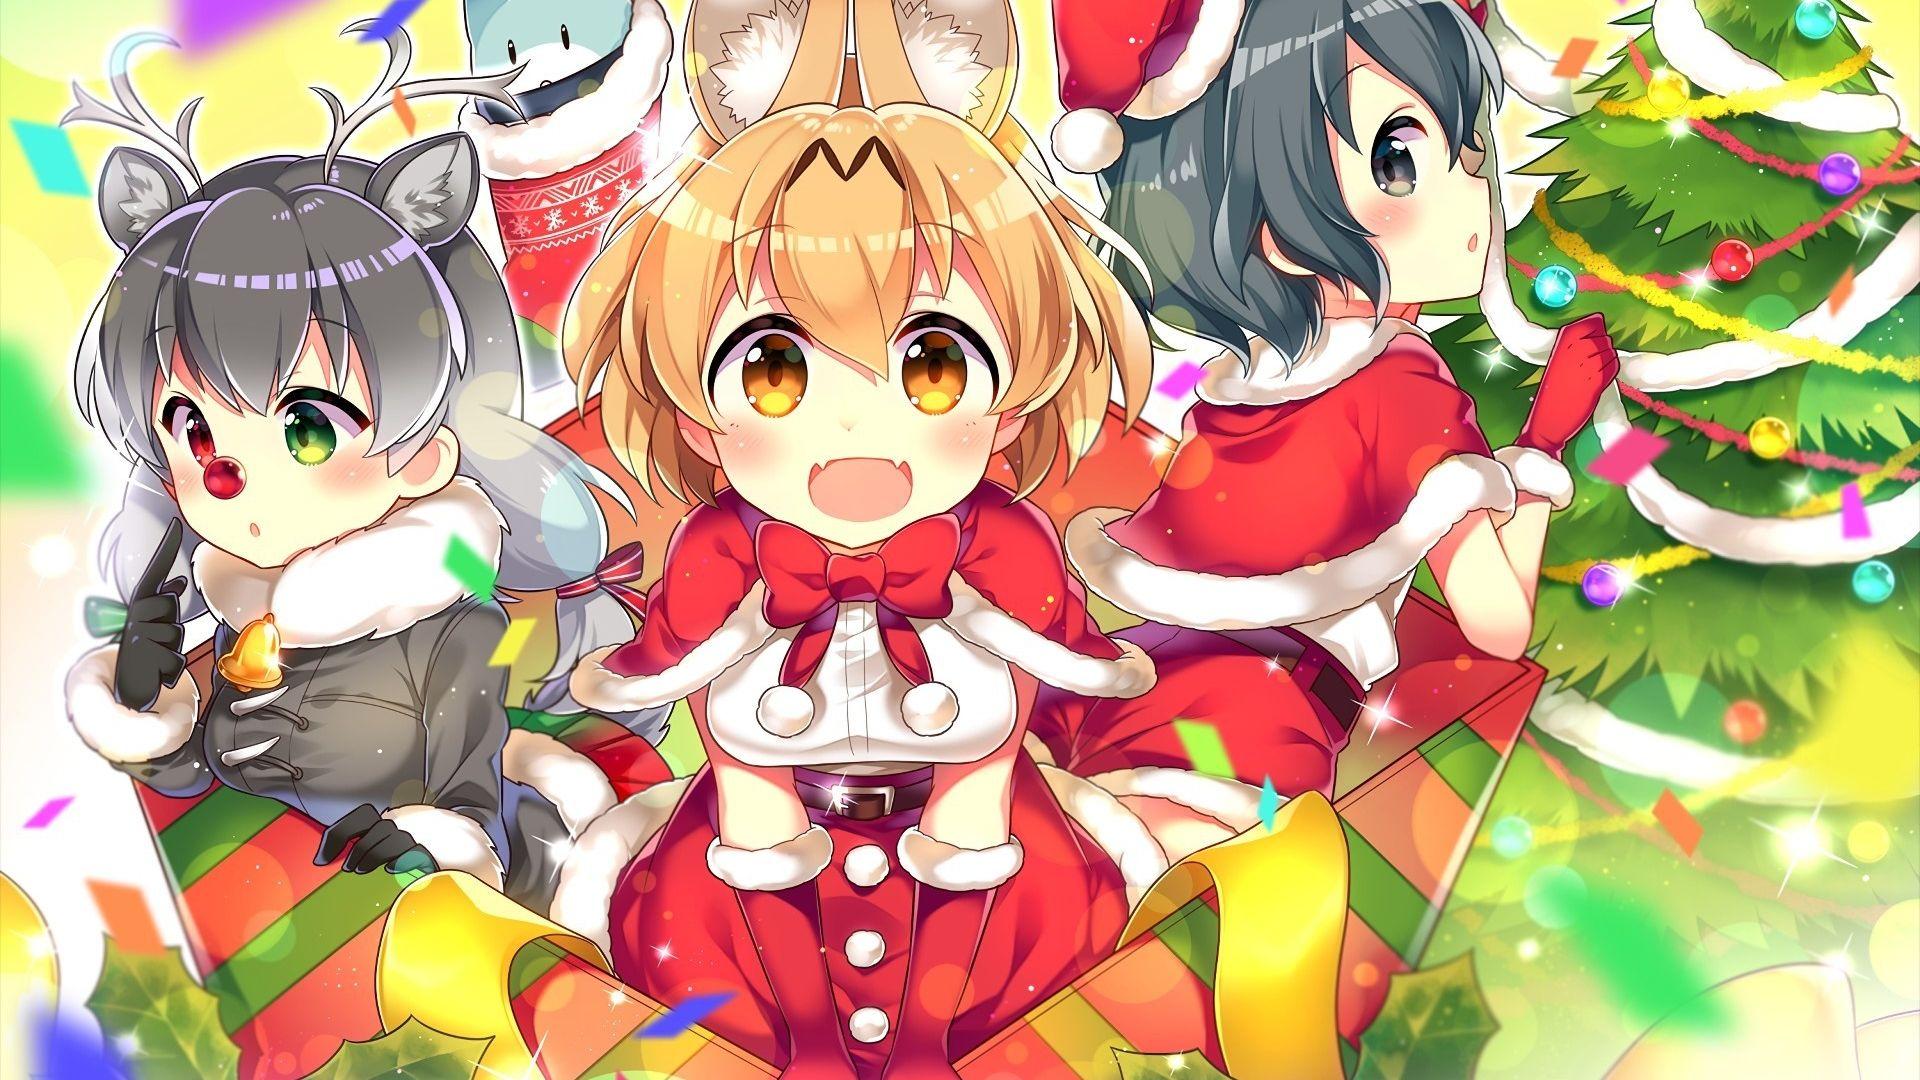 Anime Christmas Wallpaper.Desktop Wallpaper Anime Girls Kemono Friends Christmas Hd